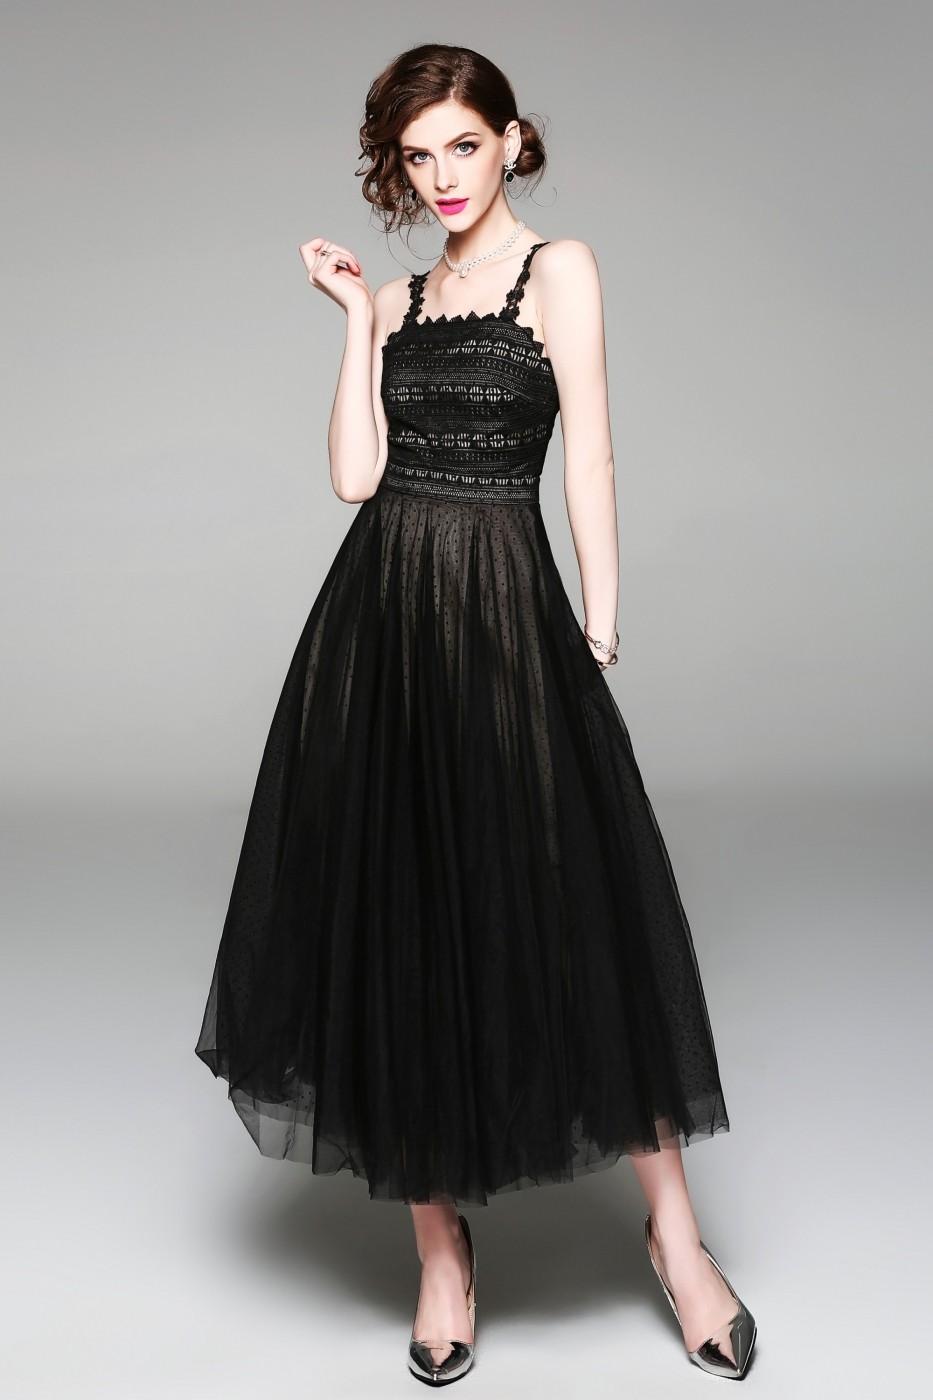 fd53519fdb Ferraga Estélyi ruha ATL-QH429_Black_els Fekete - FashionUP!